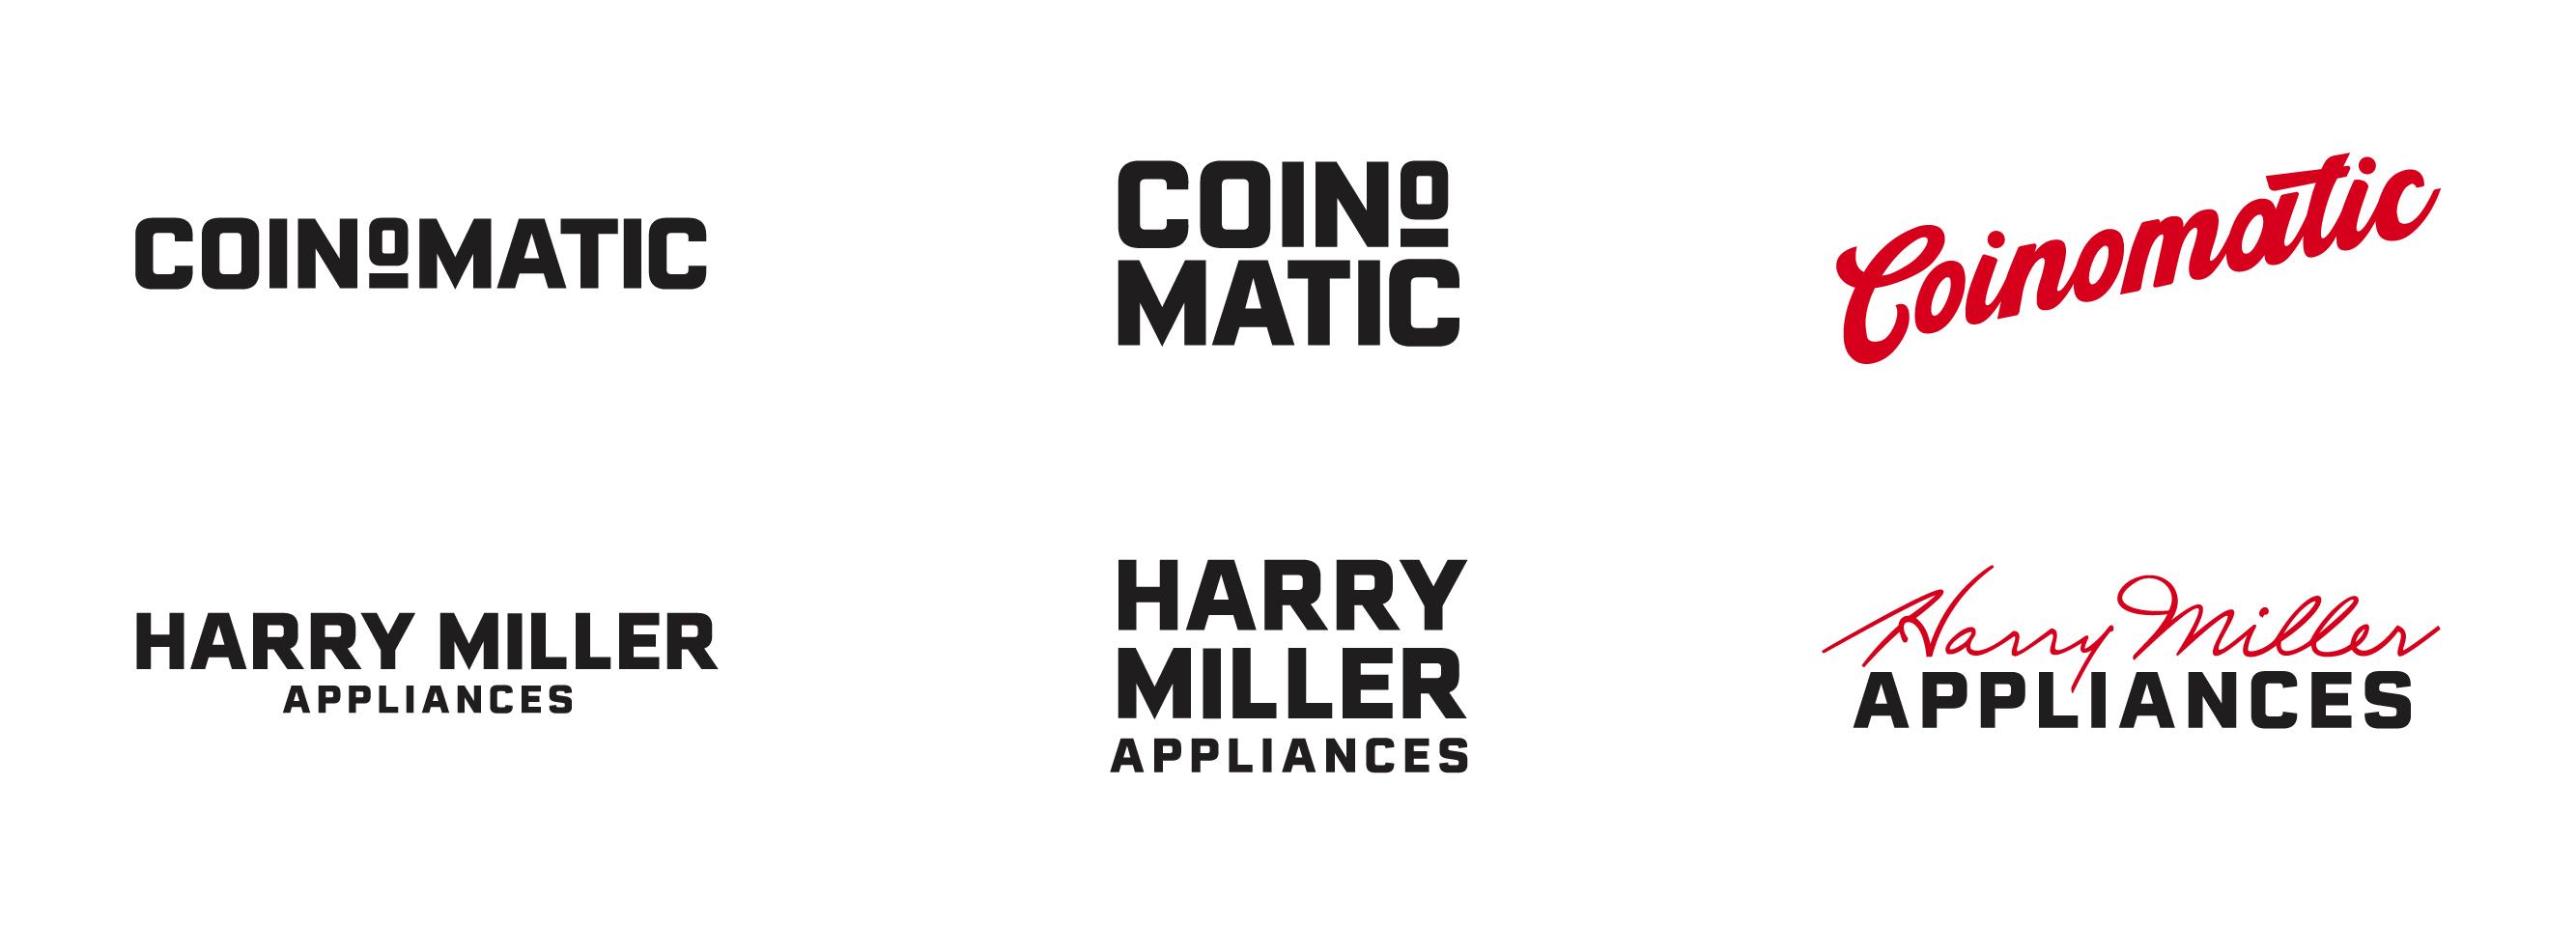 Coin-O-Matic 6 logo lockups.